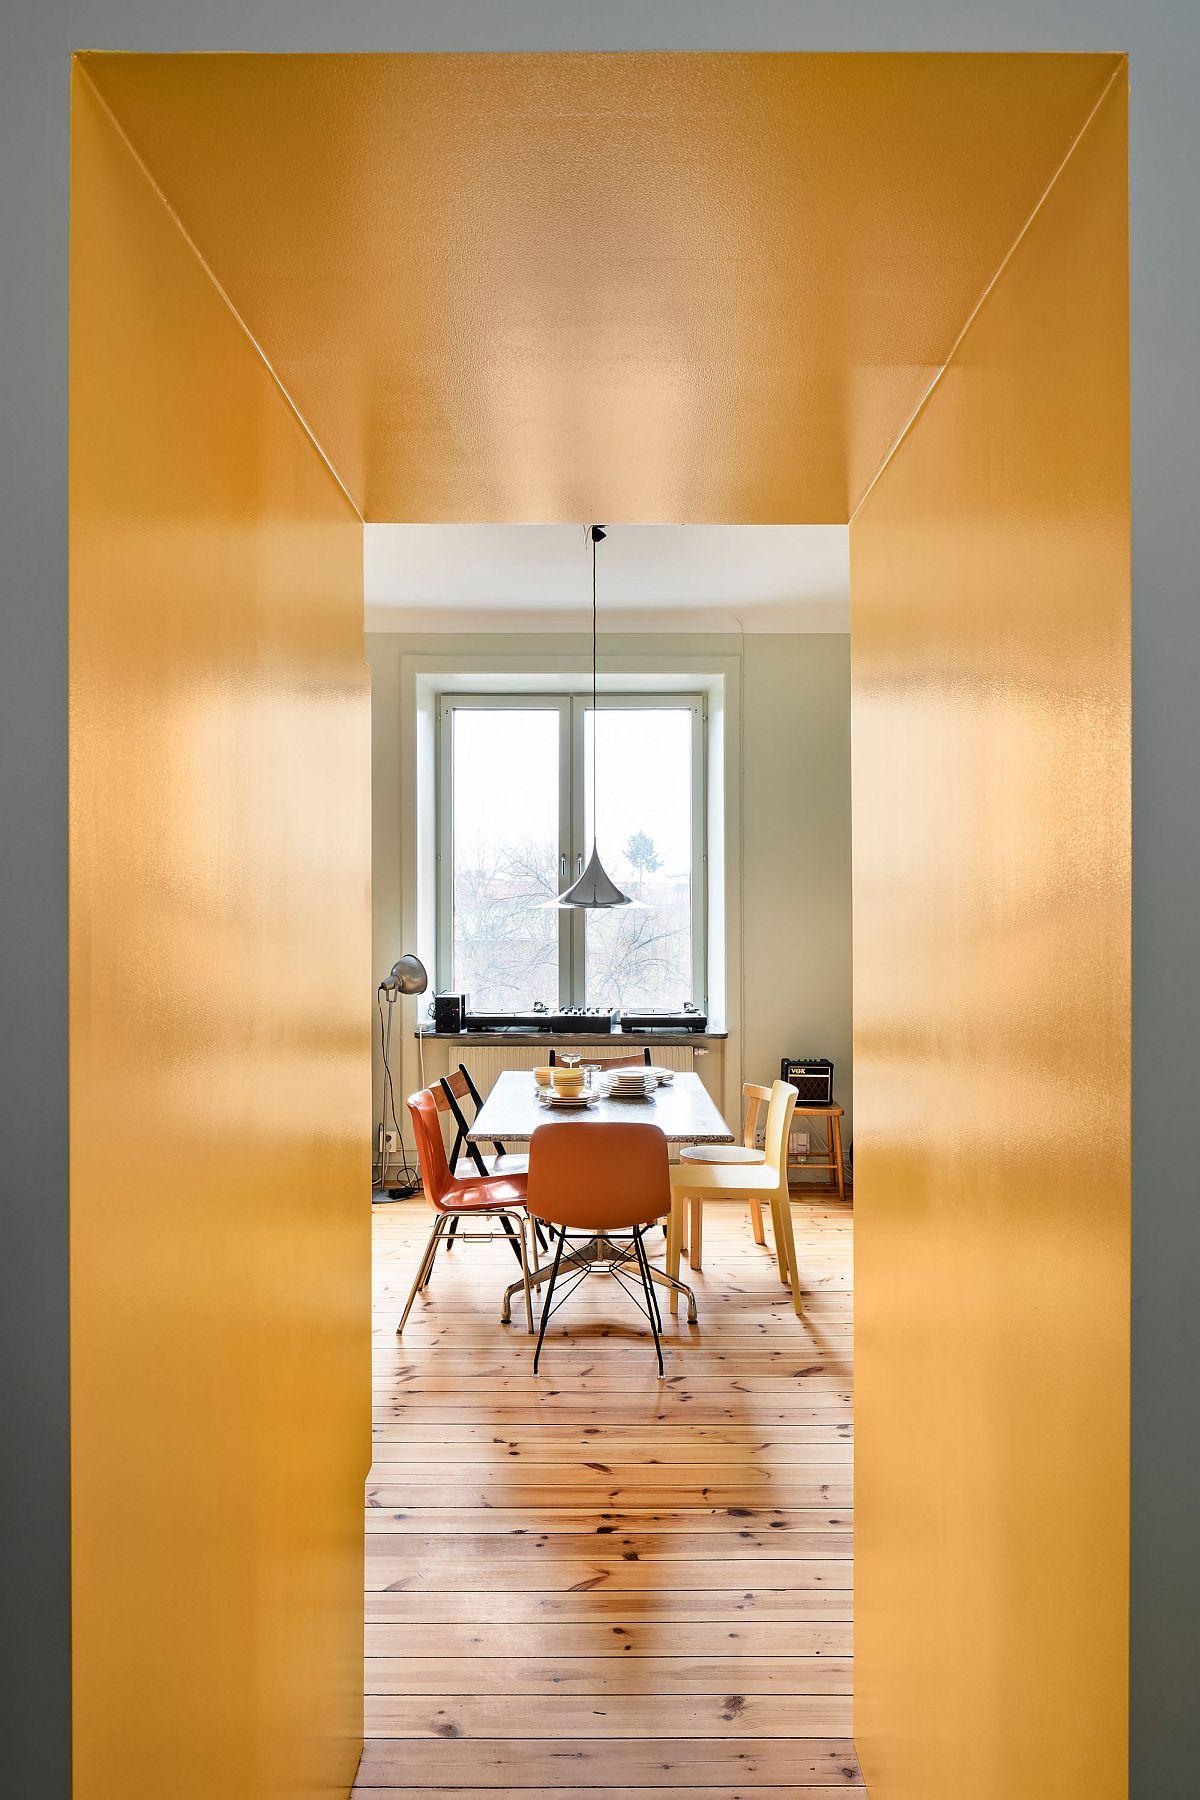 adelaparvu.com despre locuinta 80 mp, Suedia, design arh. David Lookofsky, Foto Mattias Hamren (2)